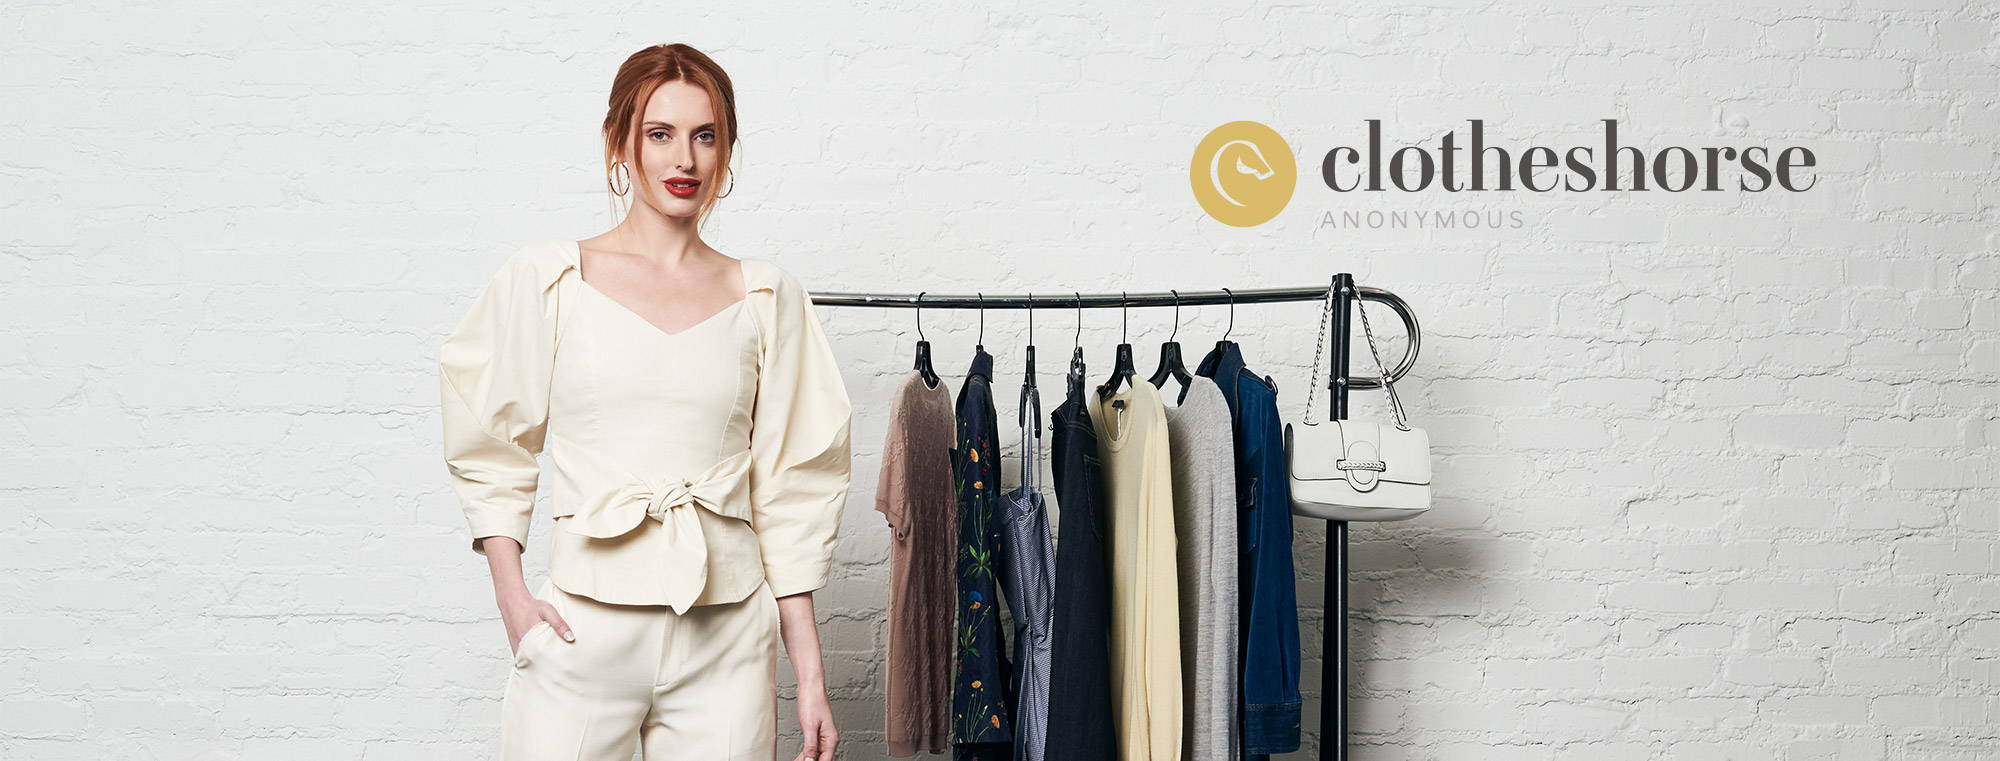 Consignment Shops Dallas Tx Online Stores Clotheshorse Anonymous